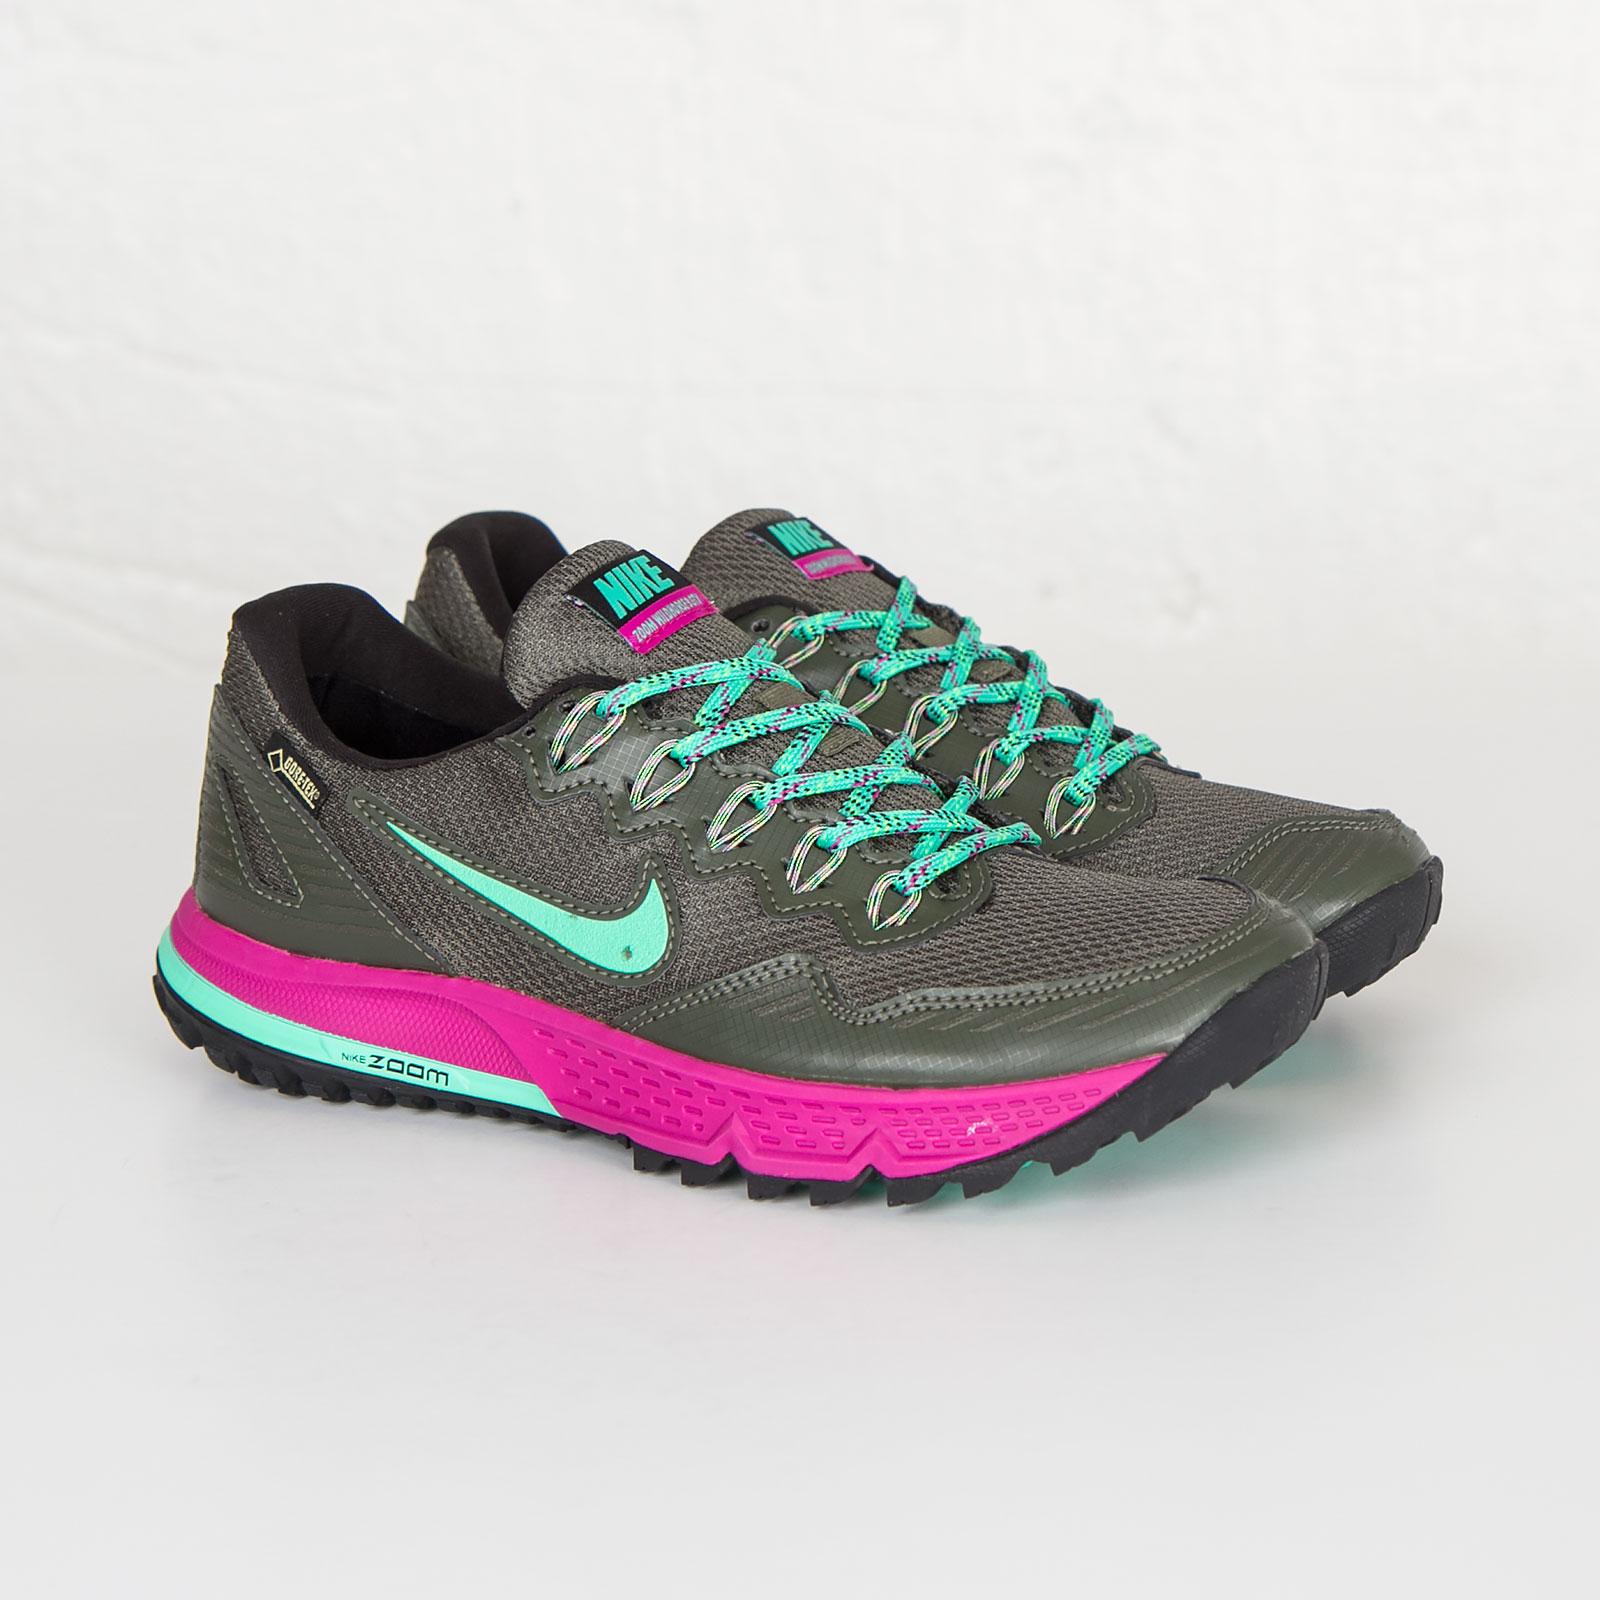 da1411dcb86 Nike Air Zoom Wildhorse 3 GTX - 805570-300 - Sneakersnstuff ...